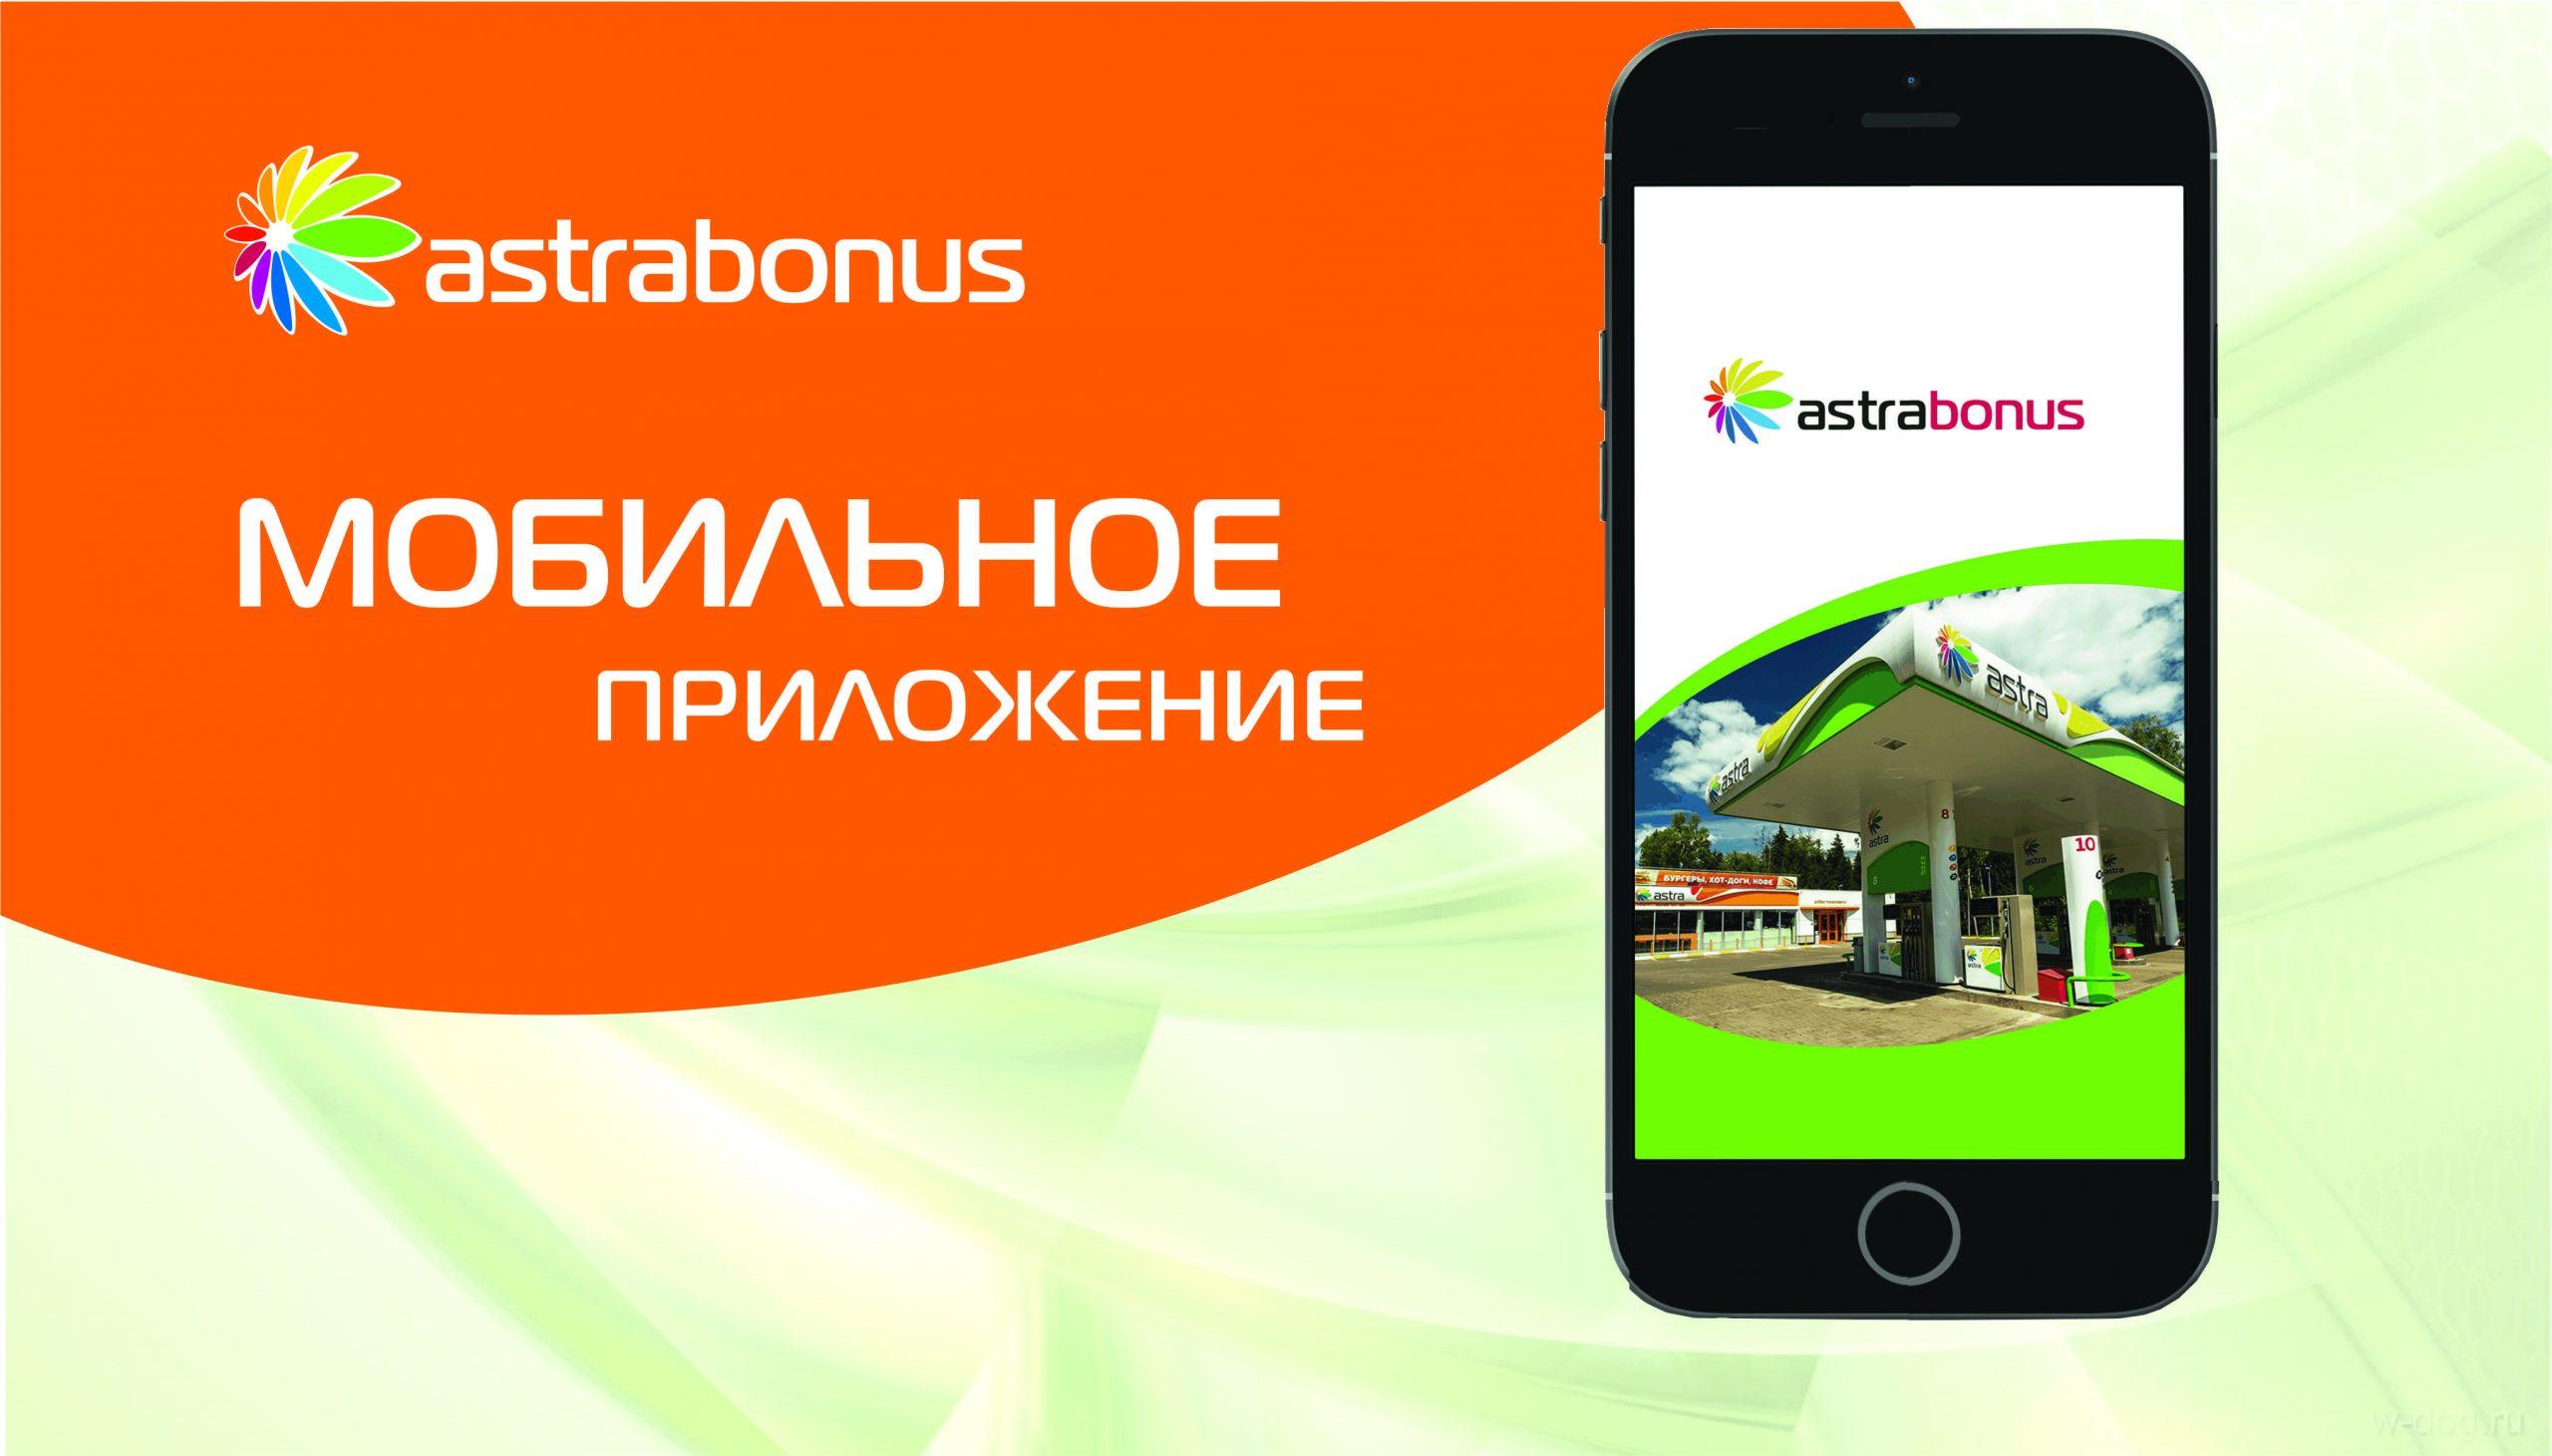 AstraBonus